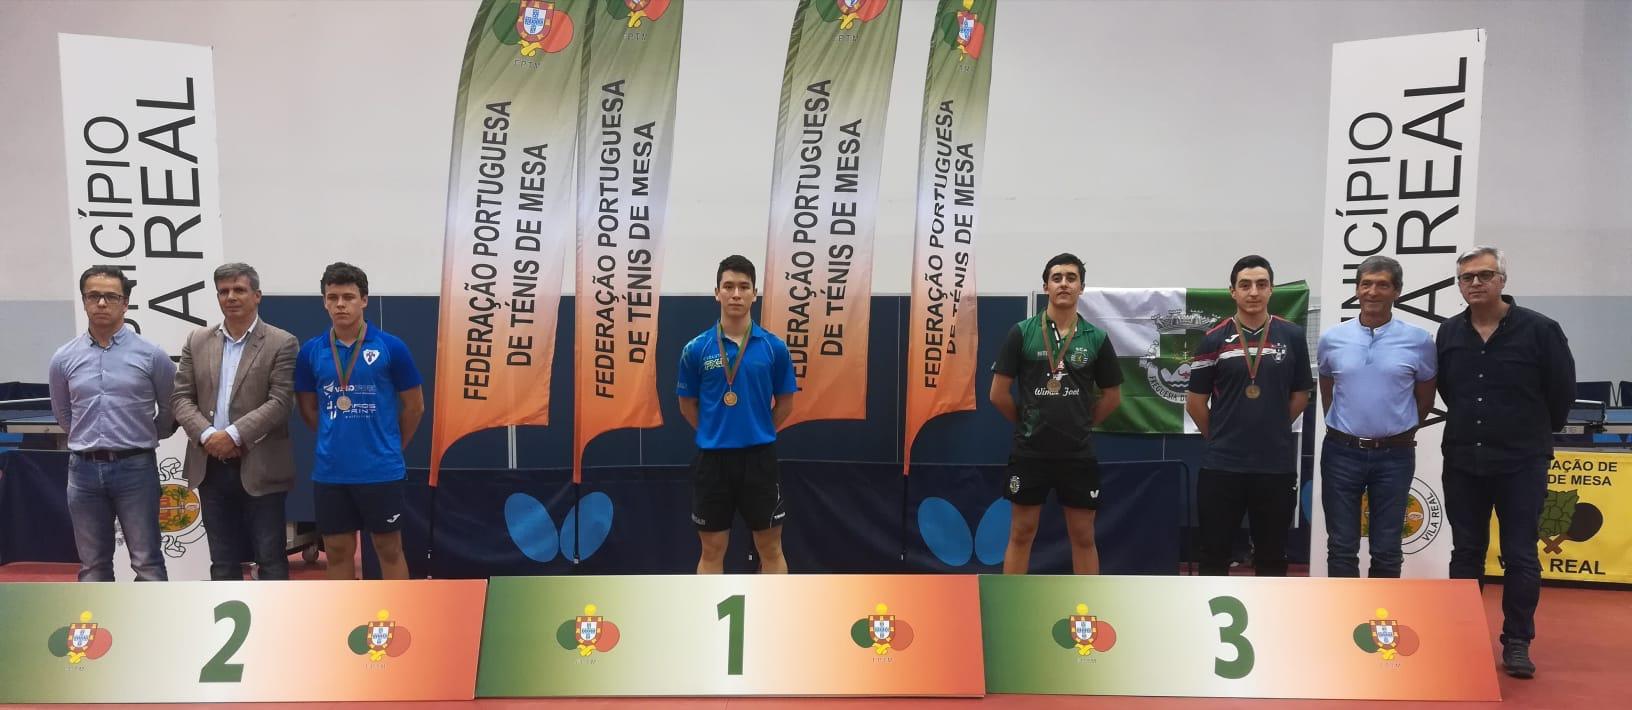 Campeonato Nacional Individual - Cadetes e Sub-21